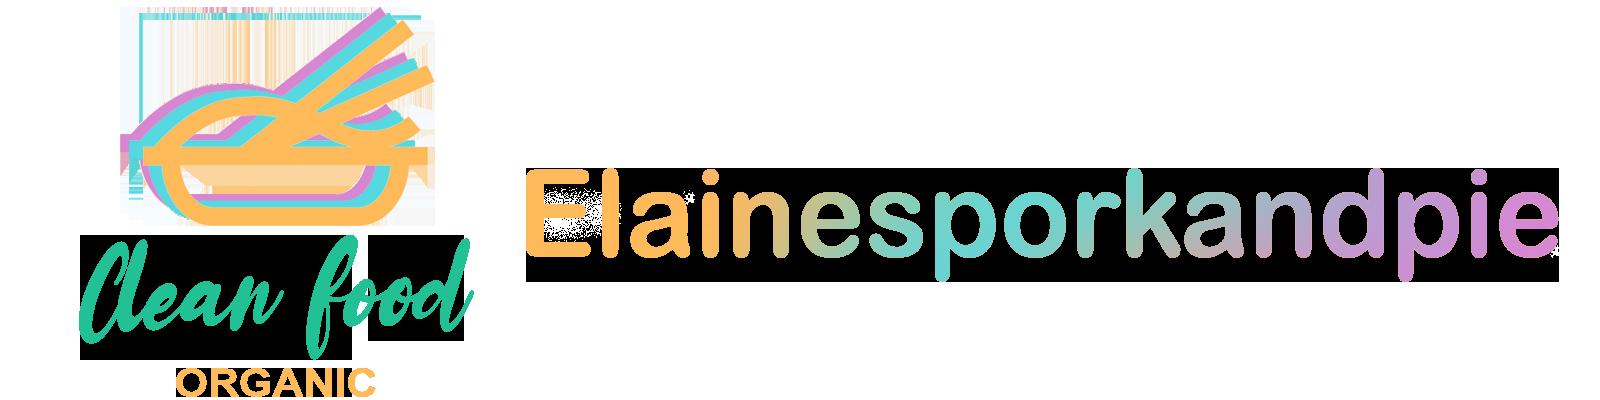 Elainesporkandpie